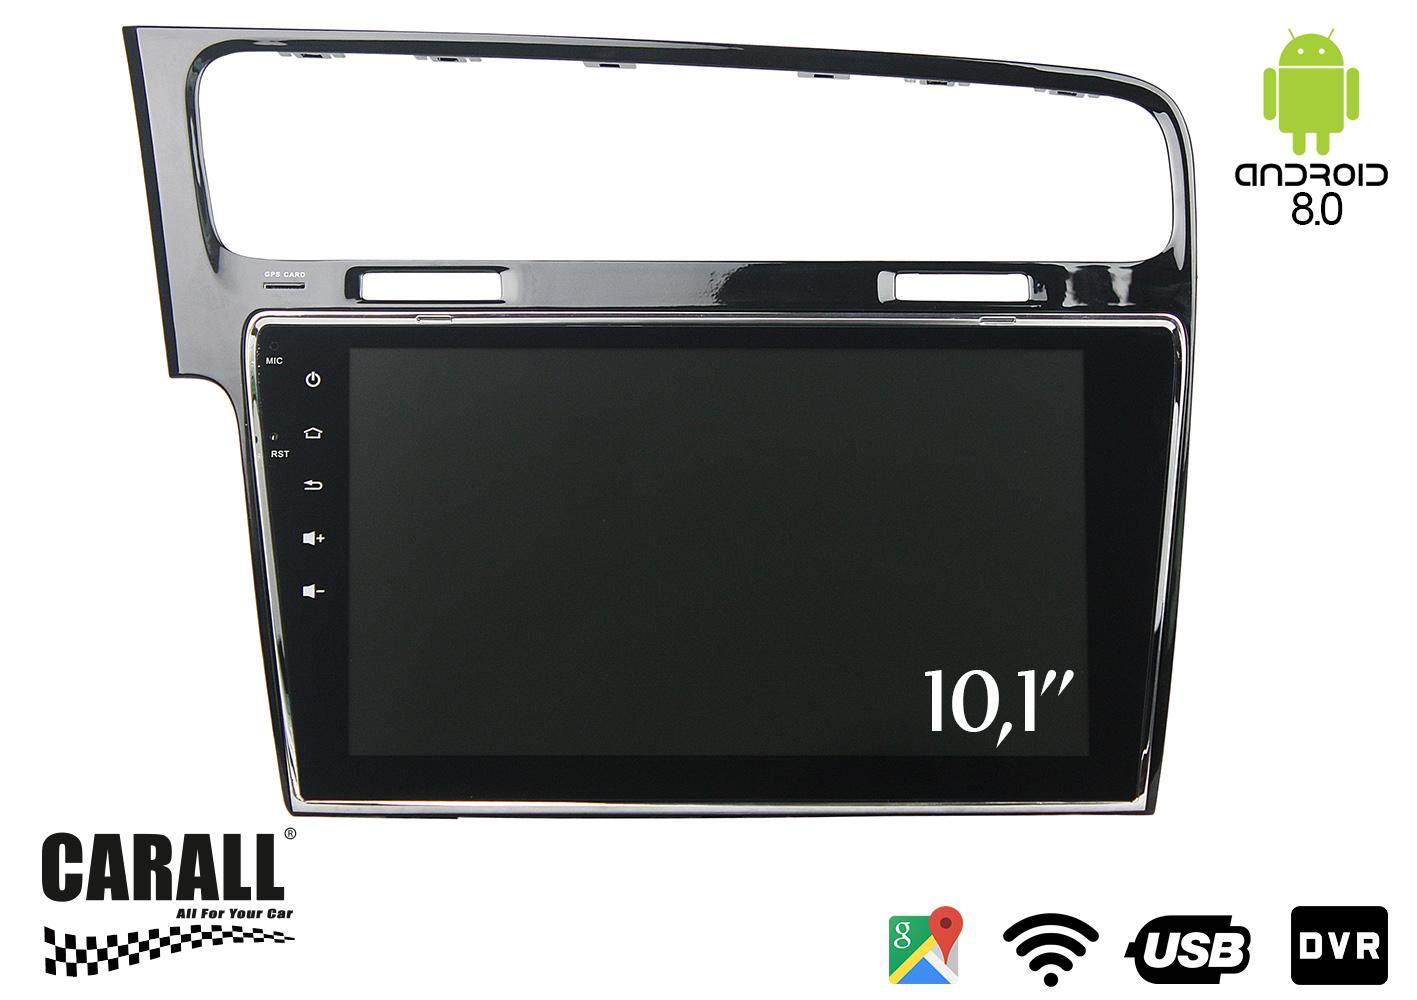 Autoradio Android 8,0 VW Golf 7 GPS DVD USB SD WI-FI Bluetooth Navigatore - KIT